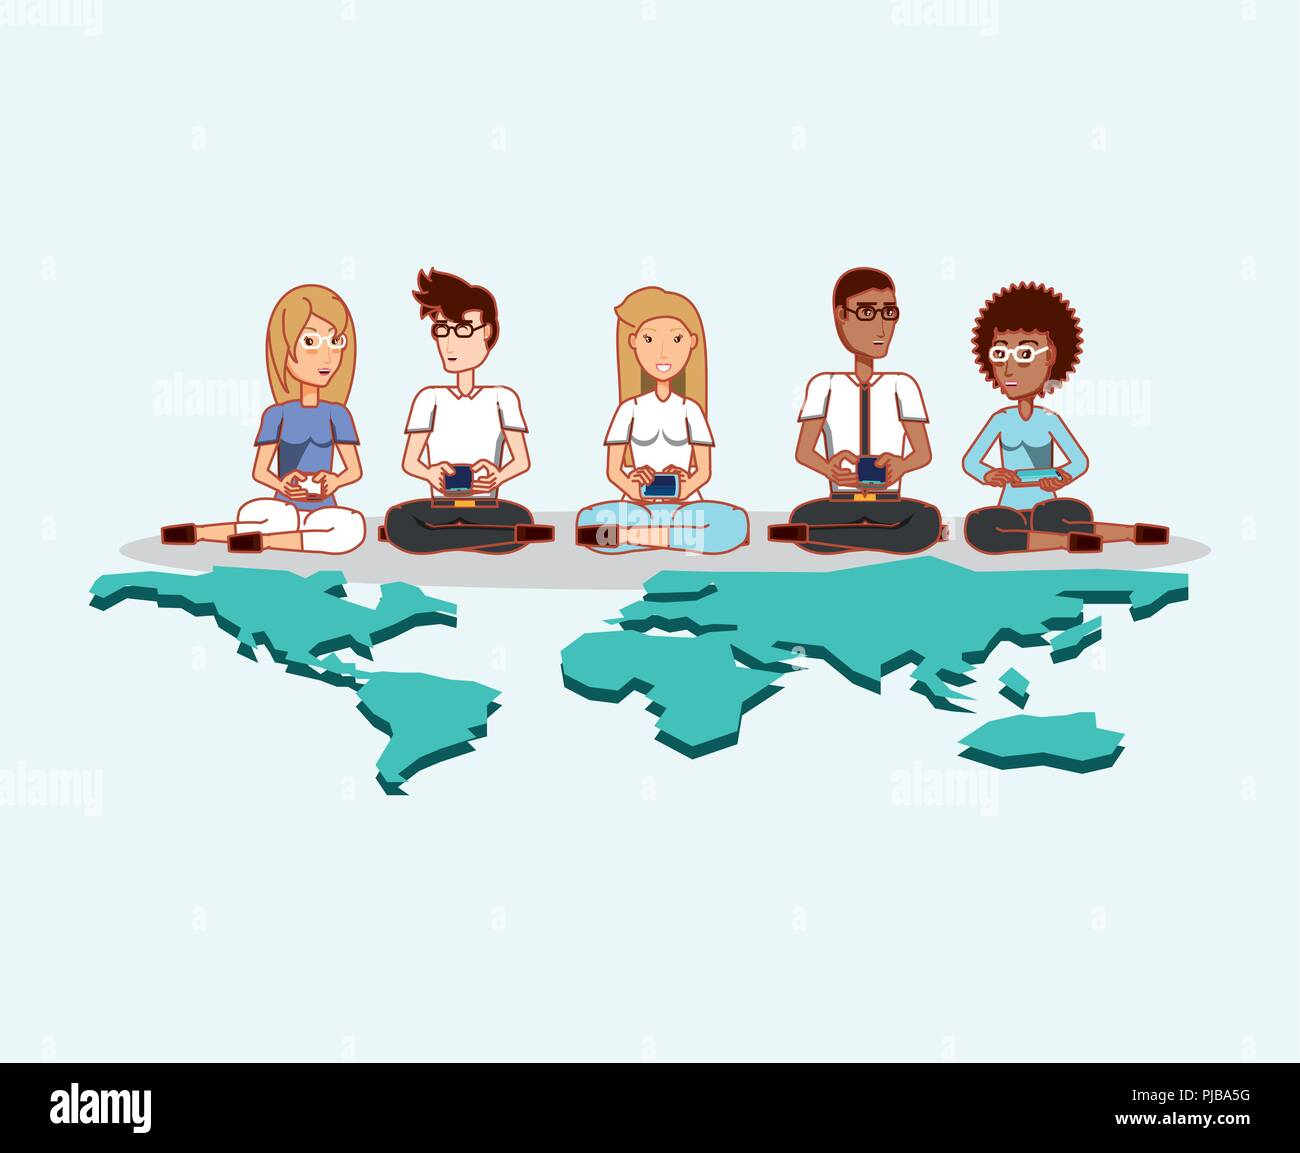 people using digital gadgets world social media vector illustration - Stock Image